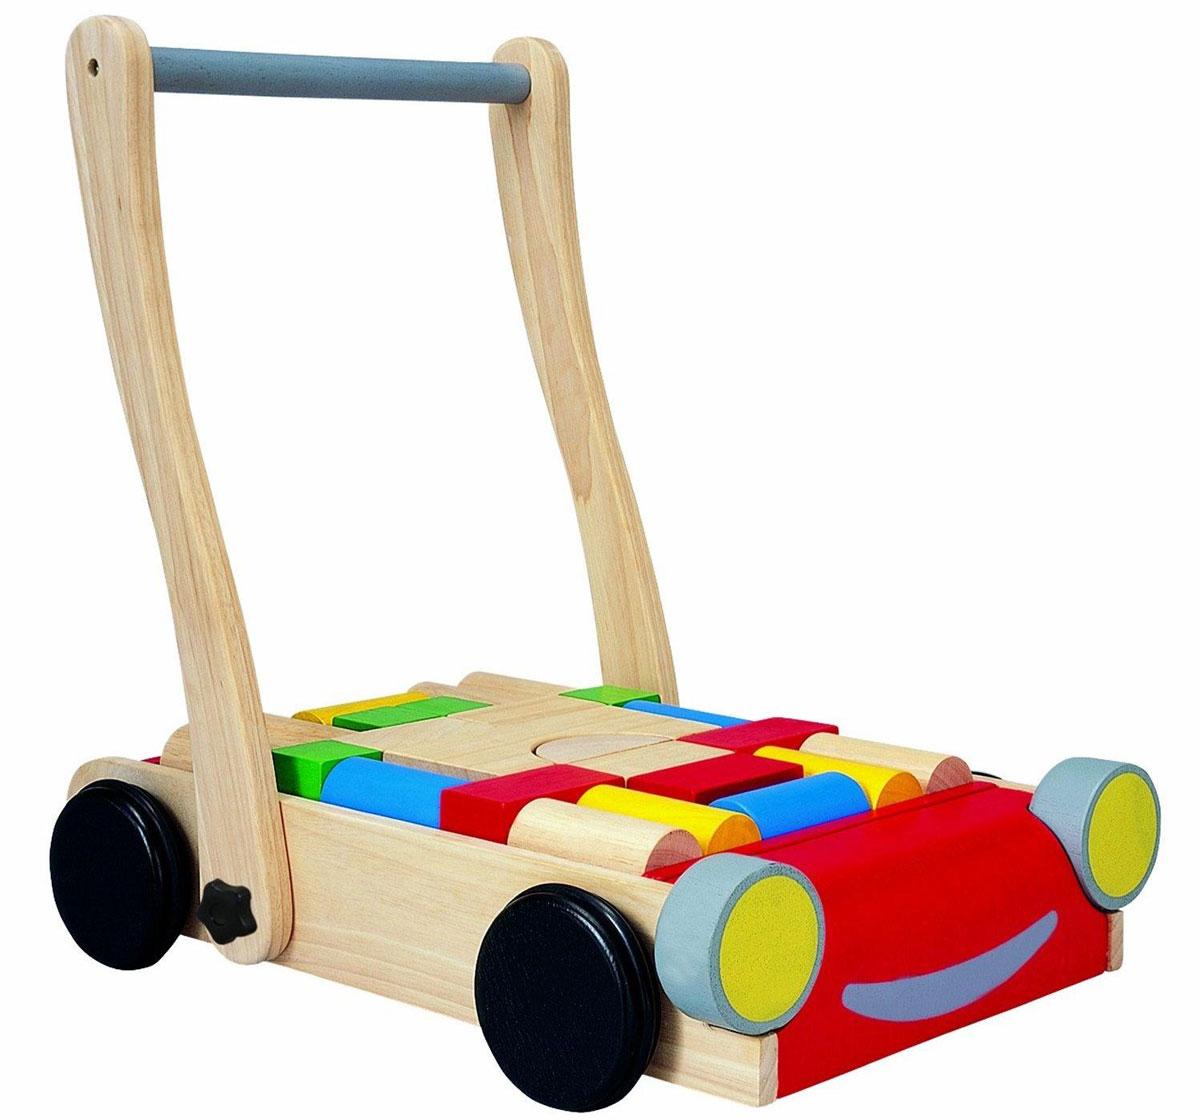 Plan Toys Конструктор Тележка с блоками конструкторы plan toys игра кактус